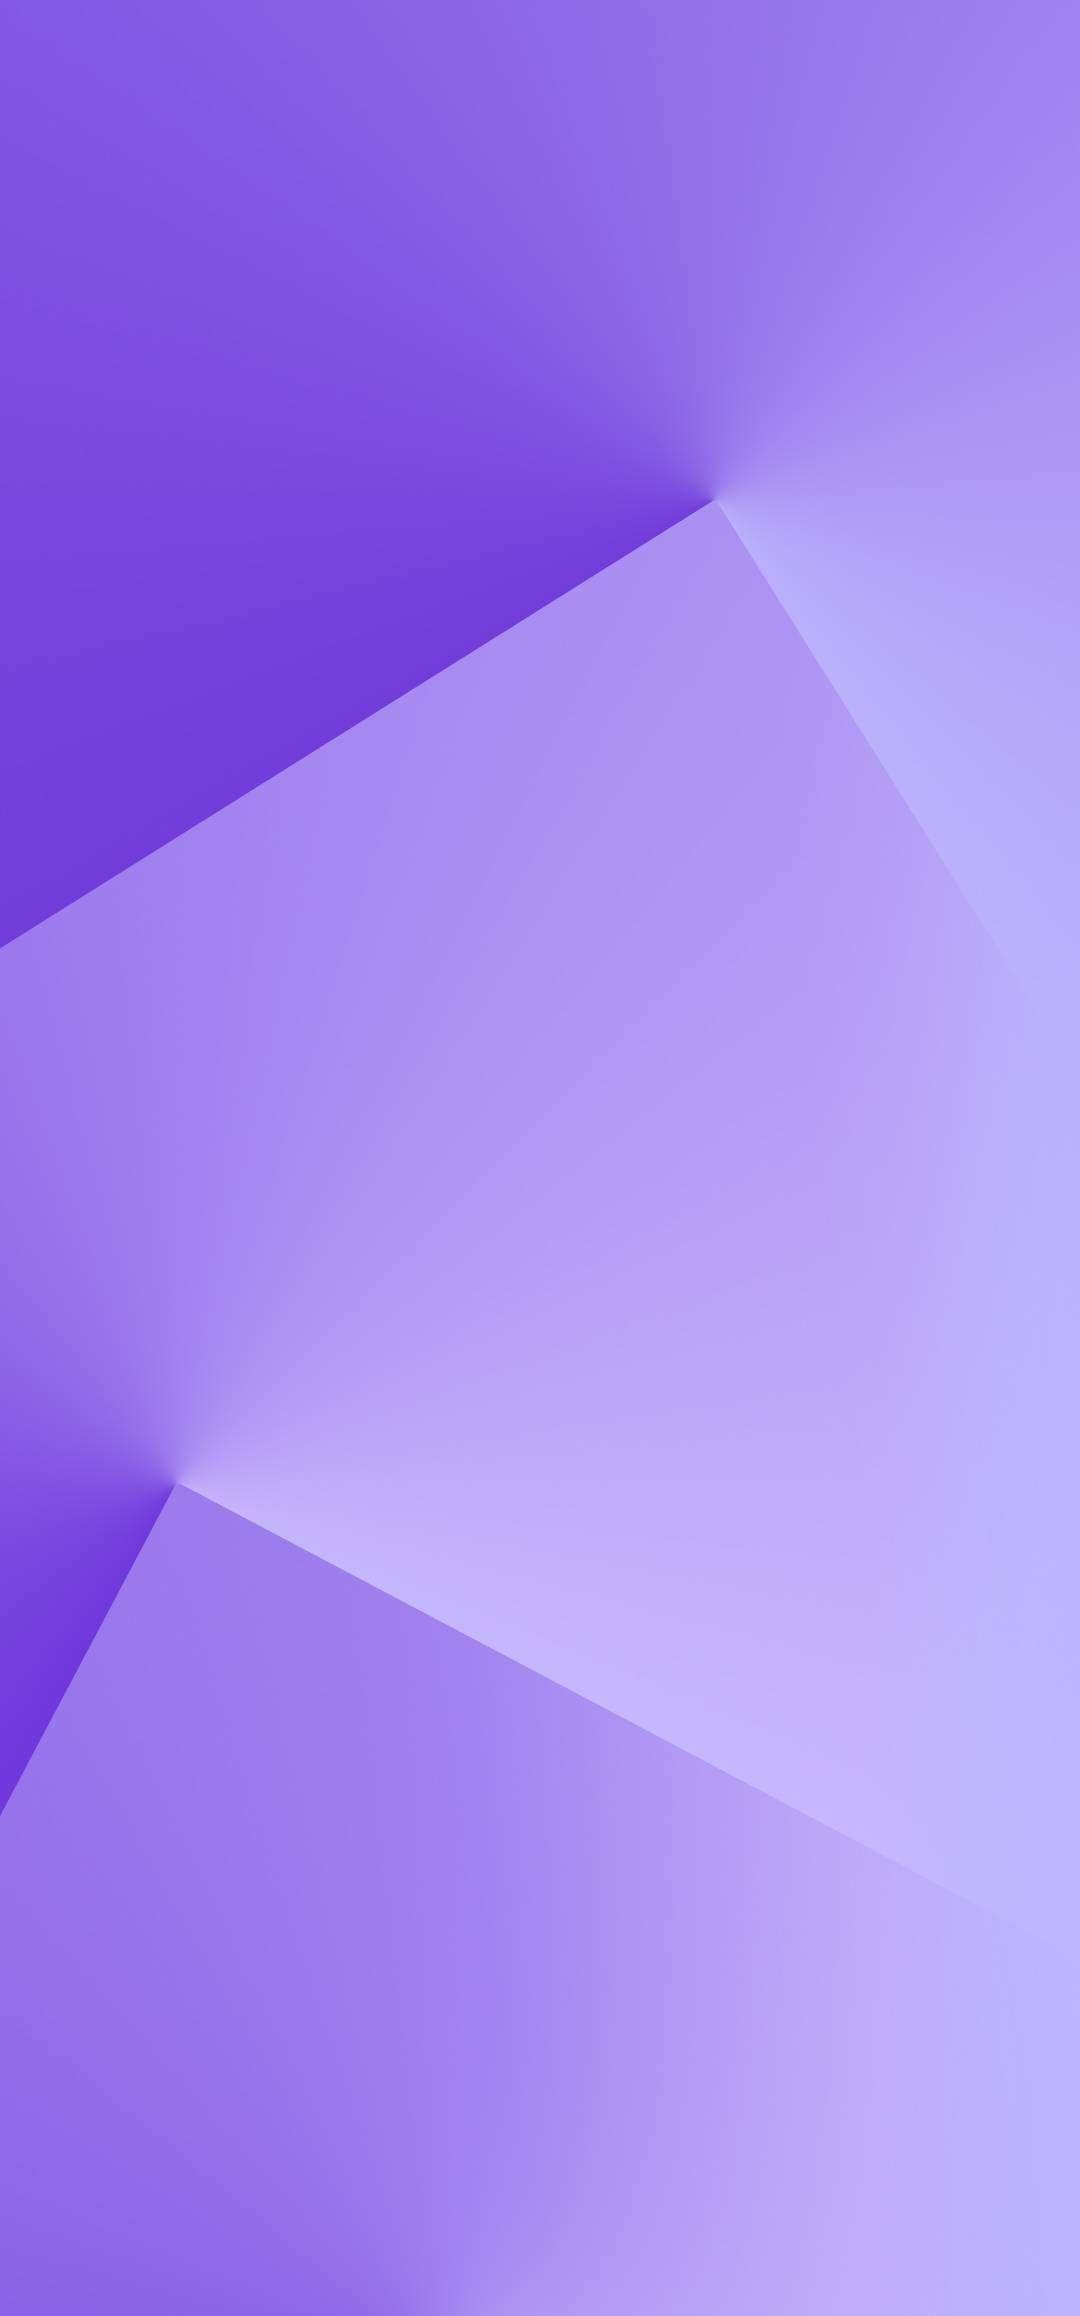 Vivo Nex Stock Wallpaper 11 1080x2316 Stock Wallpaper Purple Wallpaper Samsung Wallpaper Aesthetic beautiful vivo wallpaper